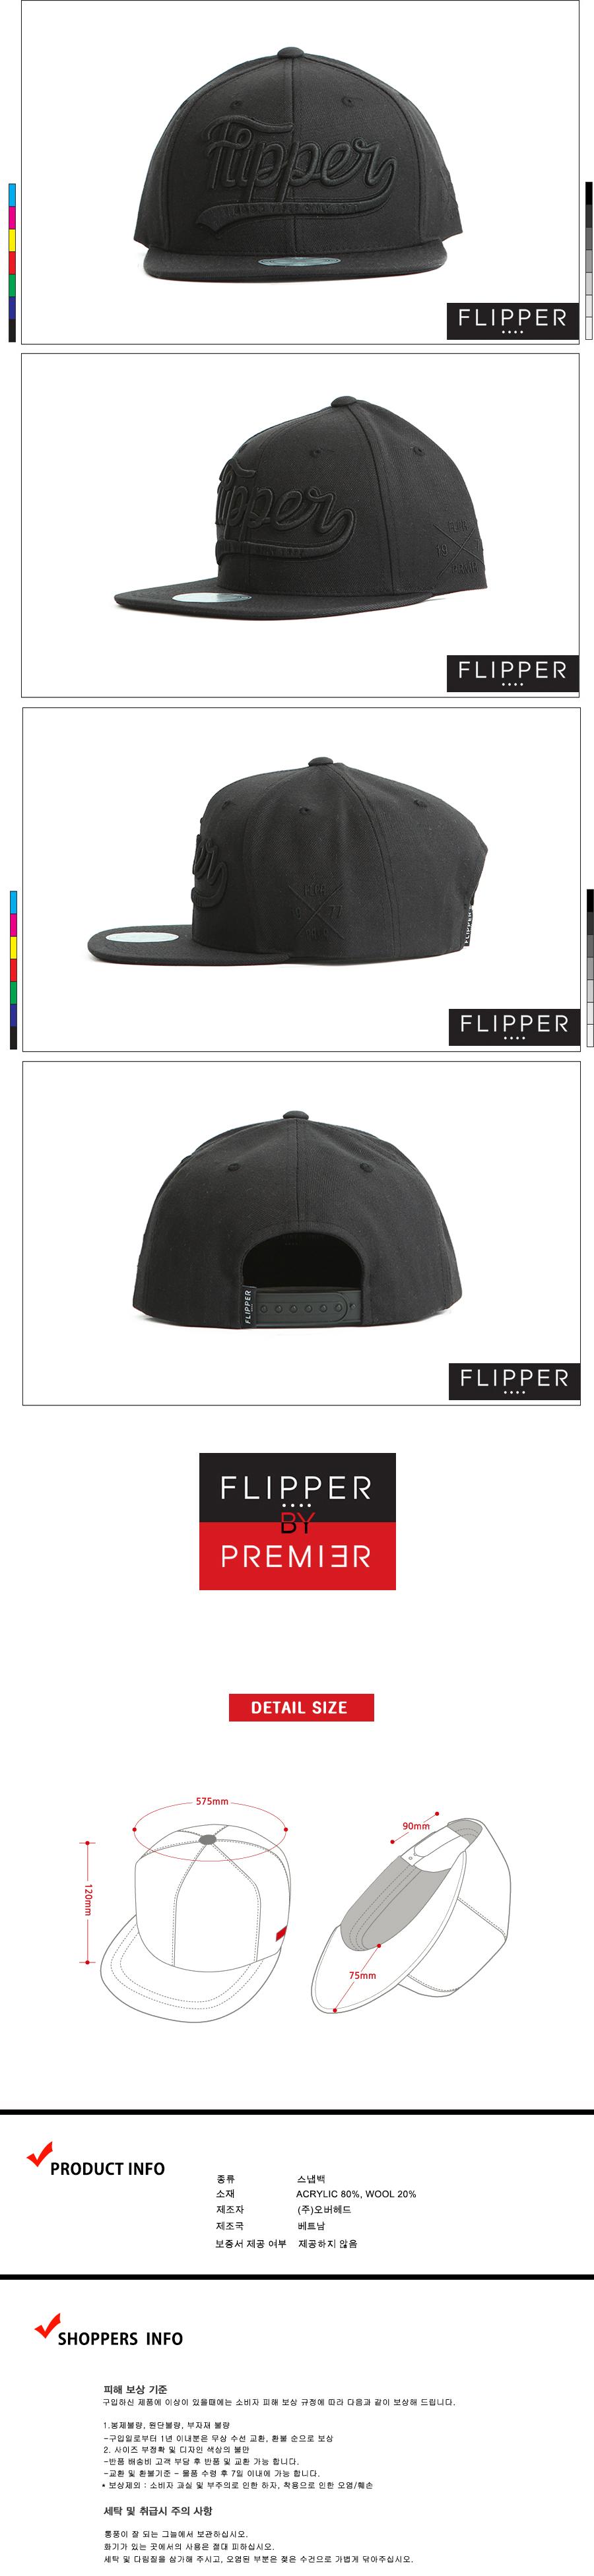 [ PREMIER ] [Premier] Flipper Snapback Cursive Logo All Black (FL049)